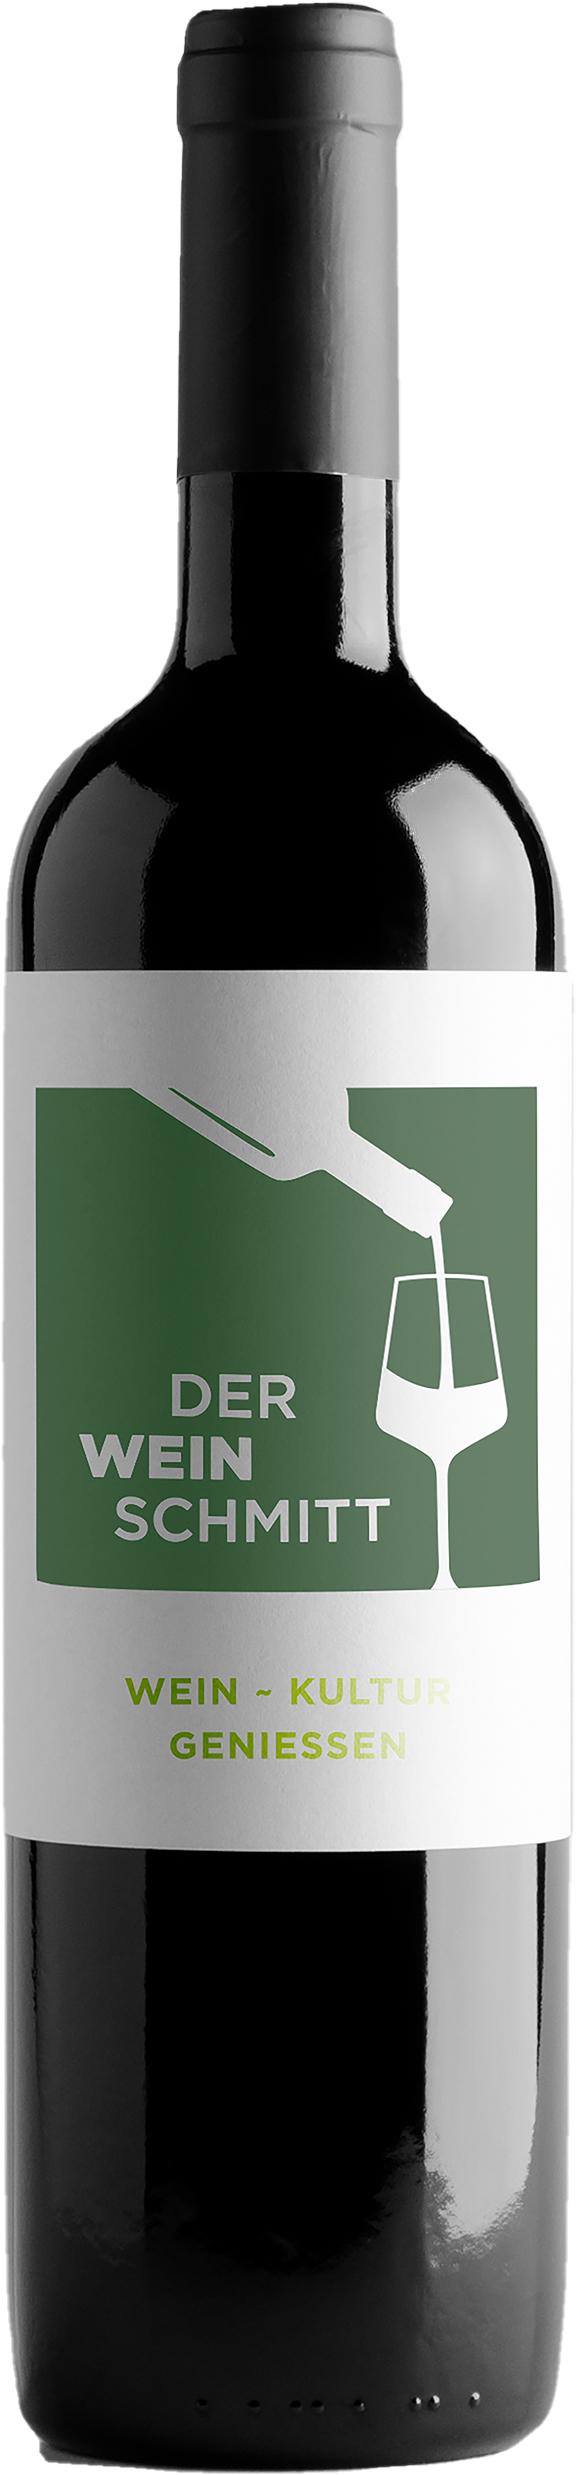 ADAMS-Wein | Kaliber 33